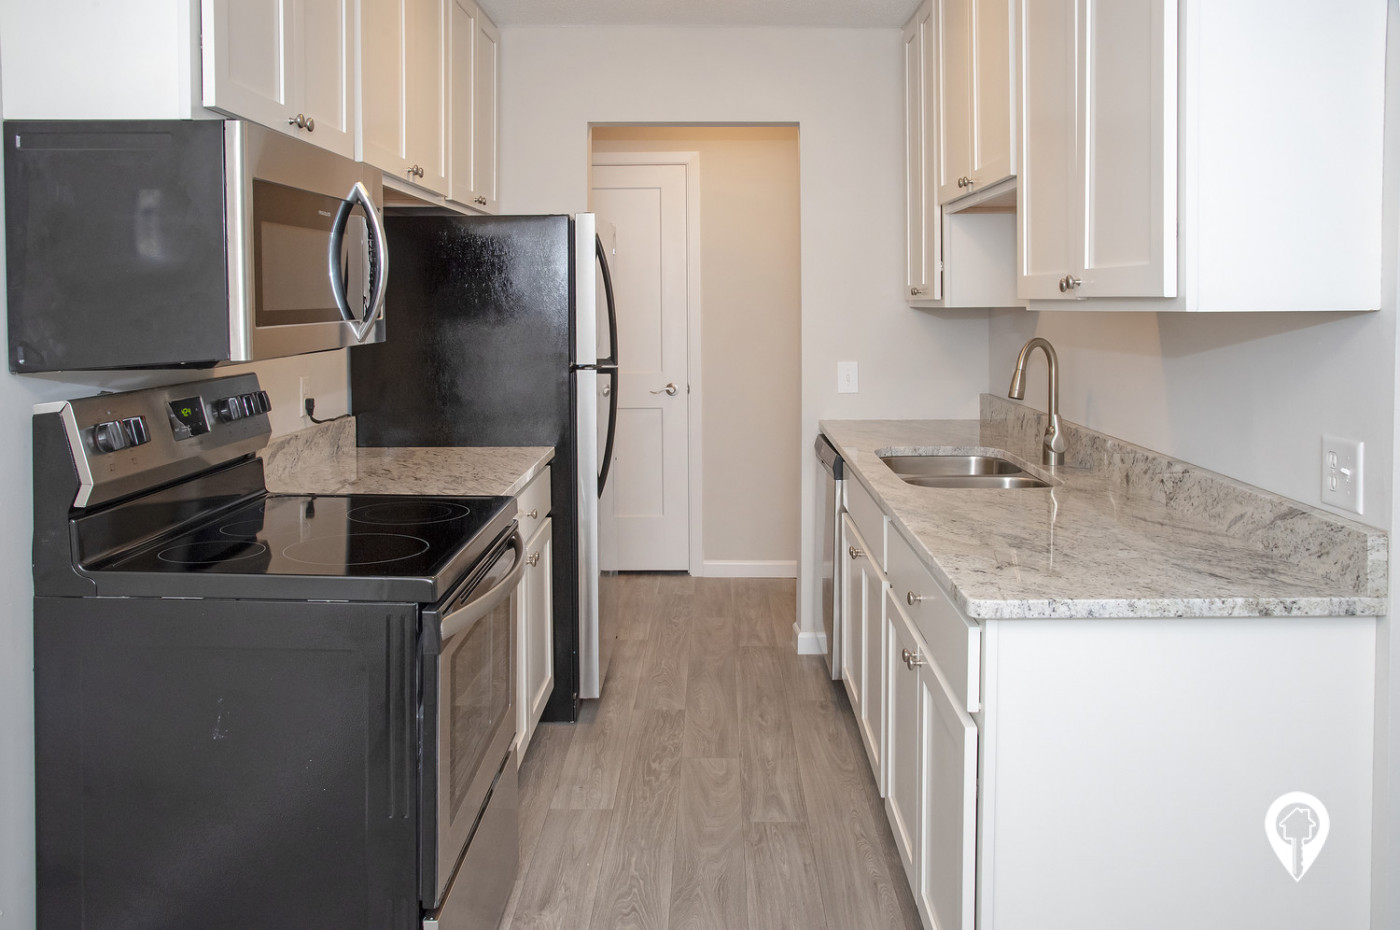 Colonial-Villa-Apartments-Wood-Look-Vinyl-Flooring-Dining-Room-Kitchens